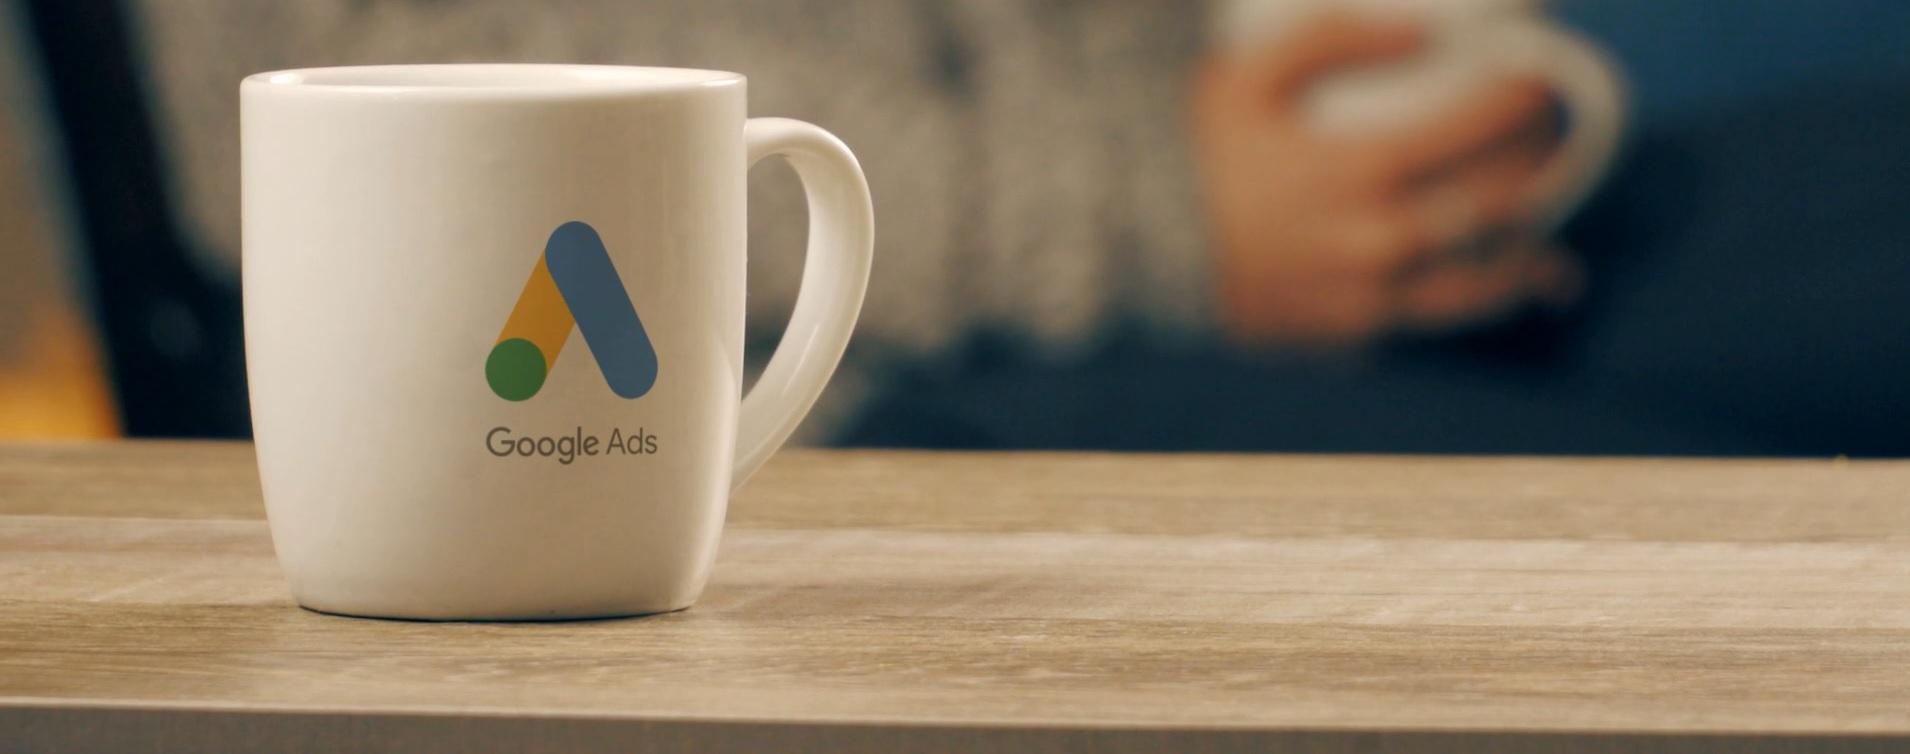 PPC Google Ads Management Company